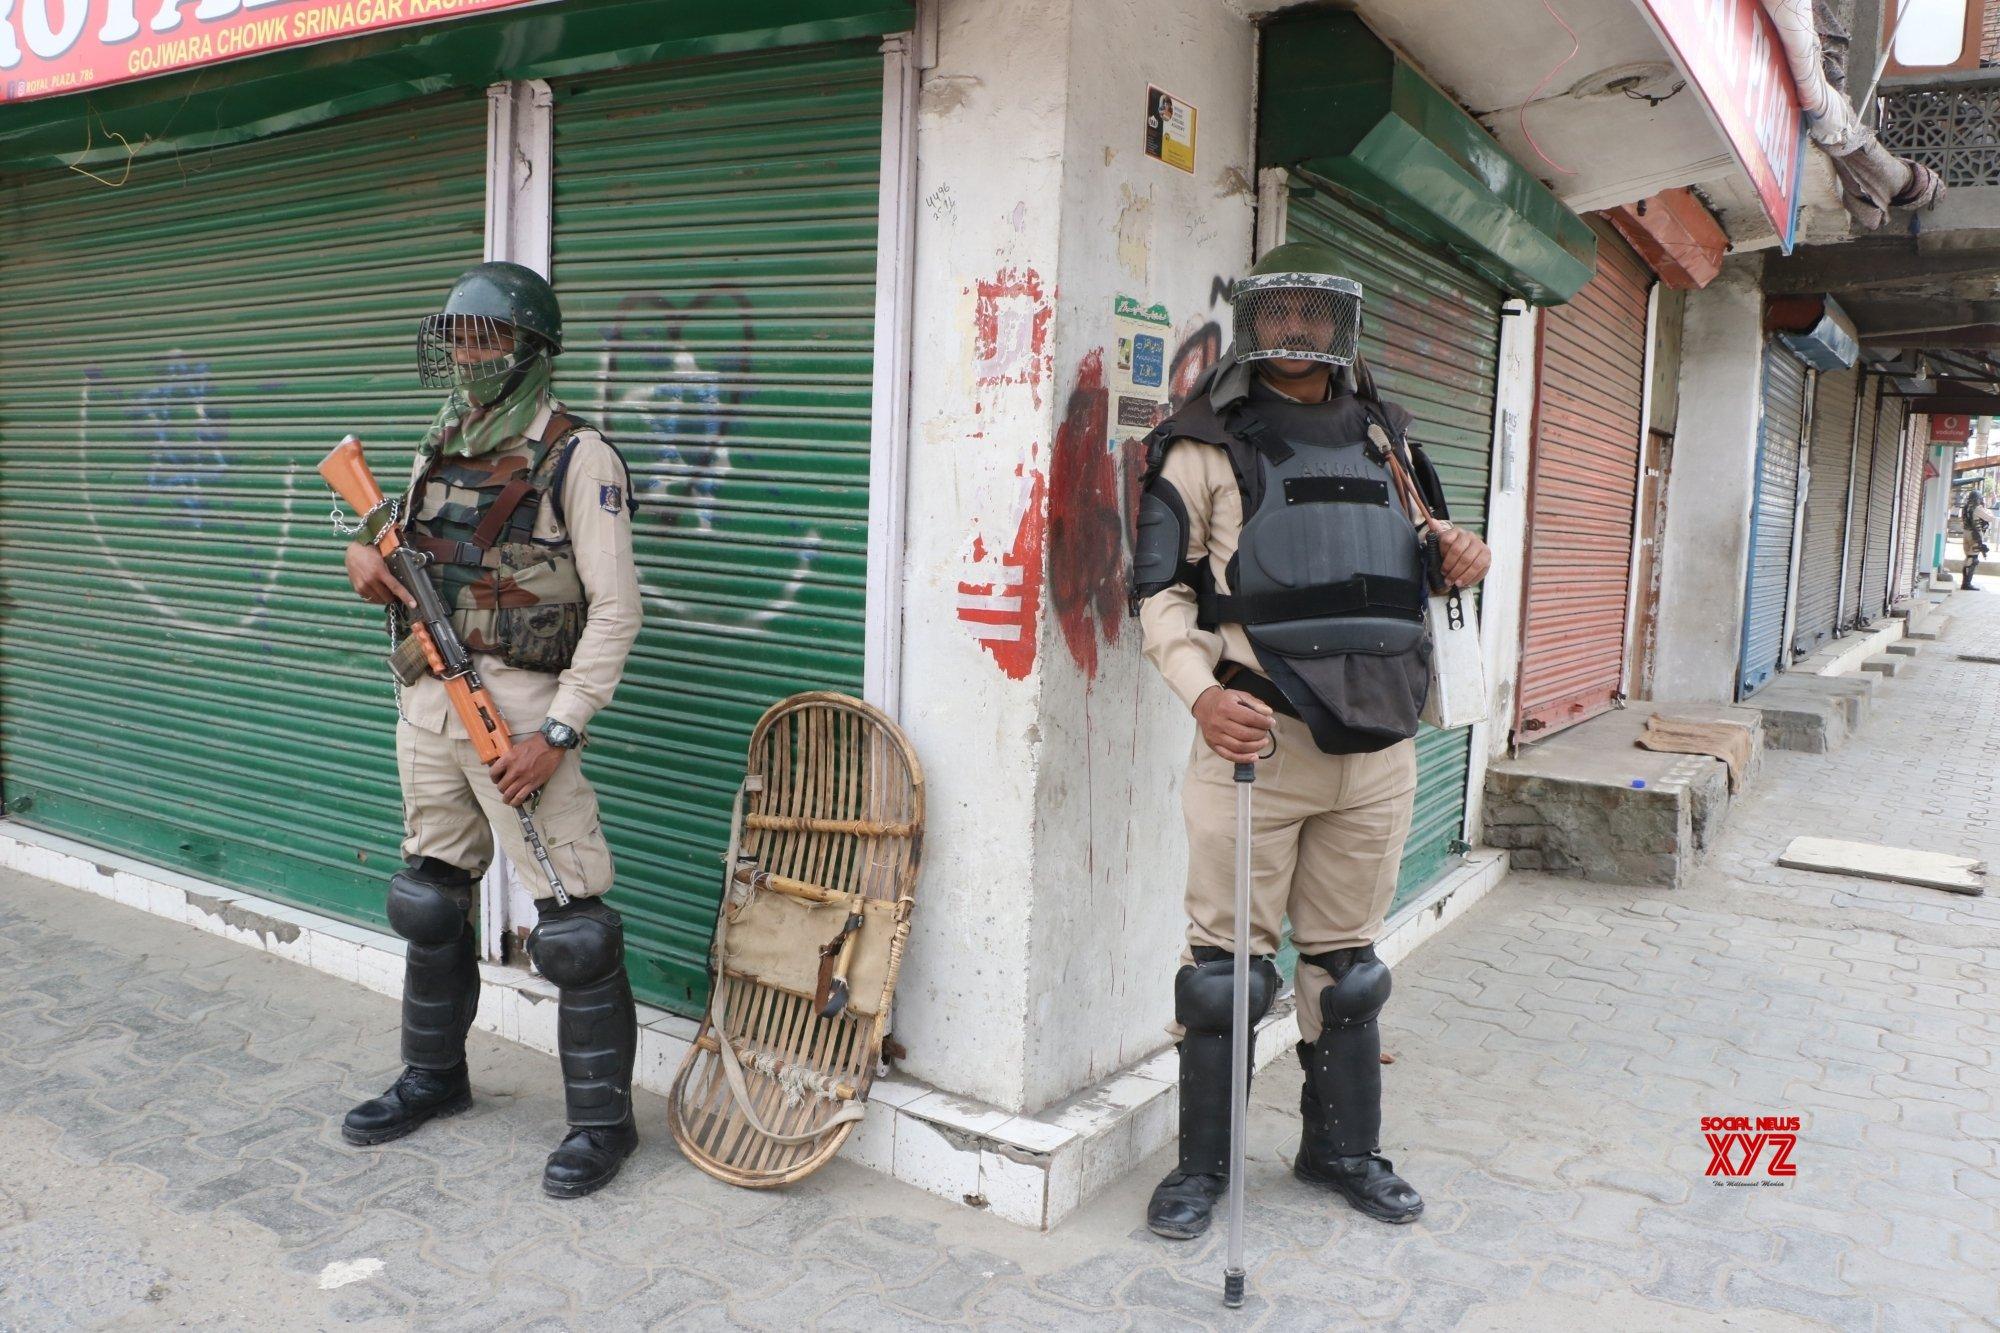 Srinagar: Separatist call shutdown over civilian killings in J&K #Gallery